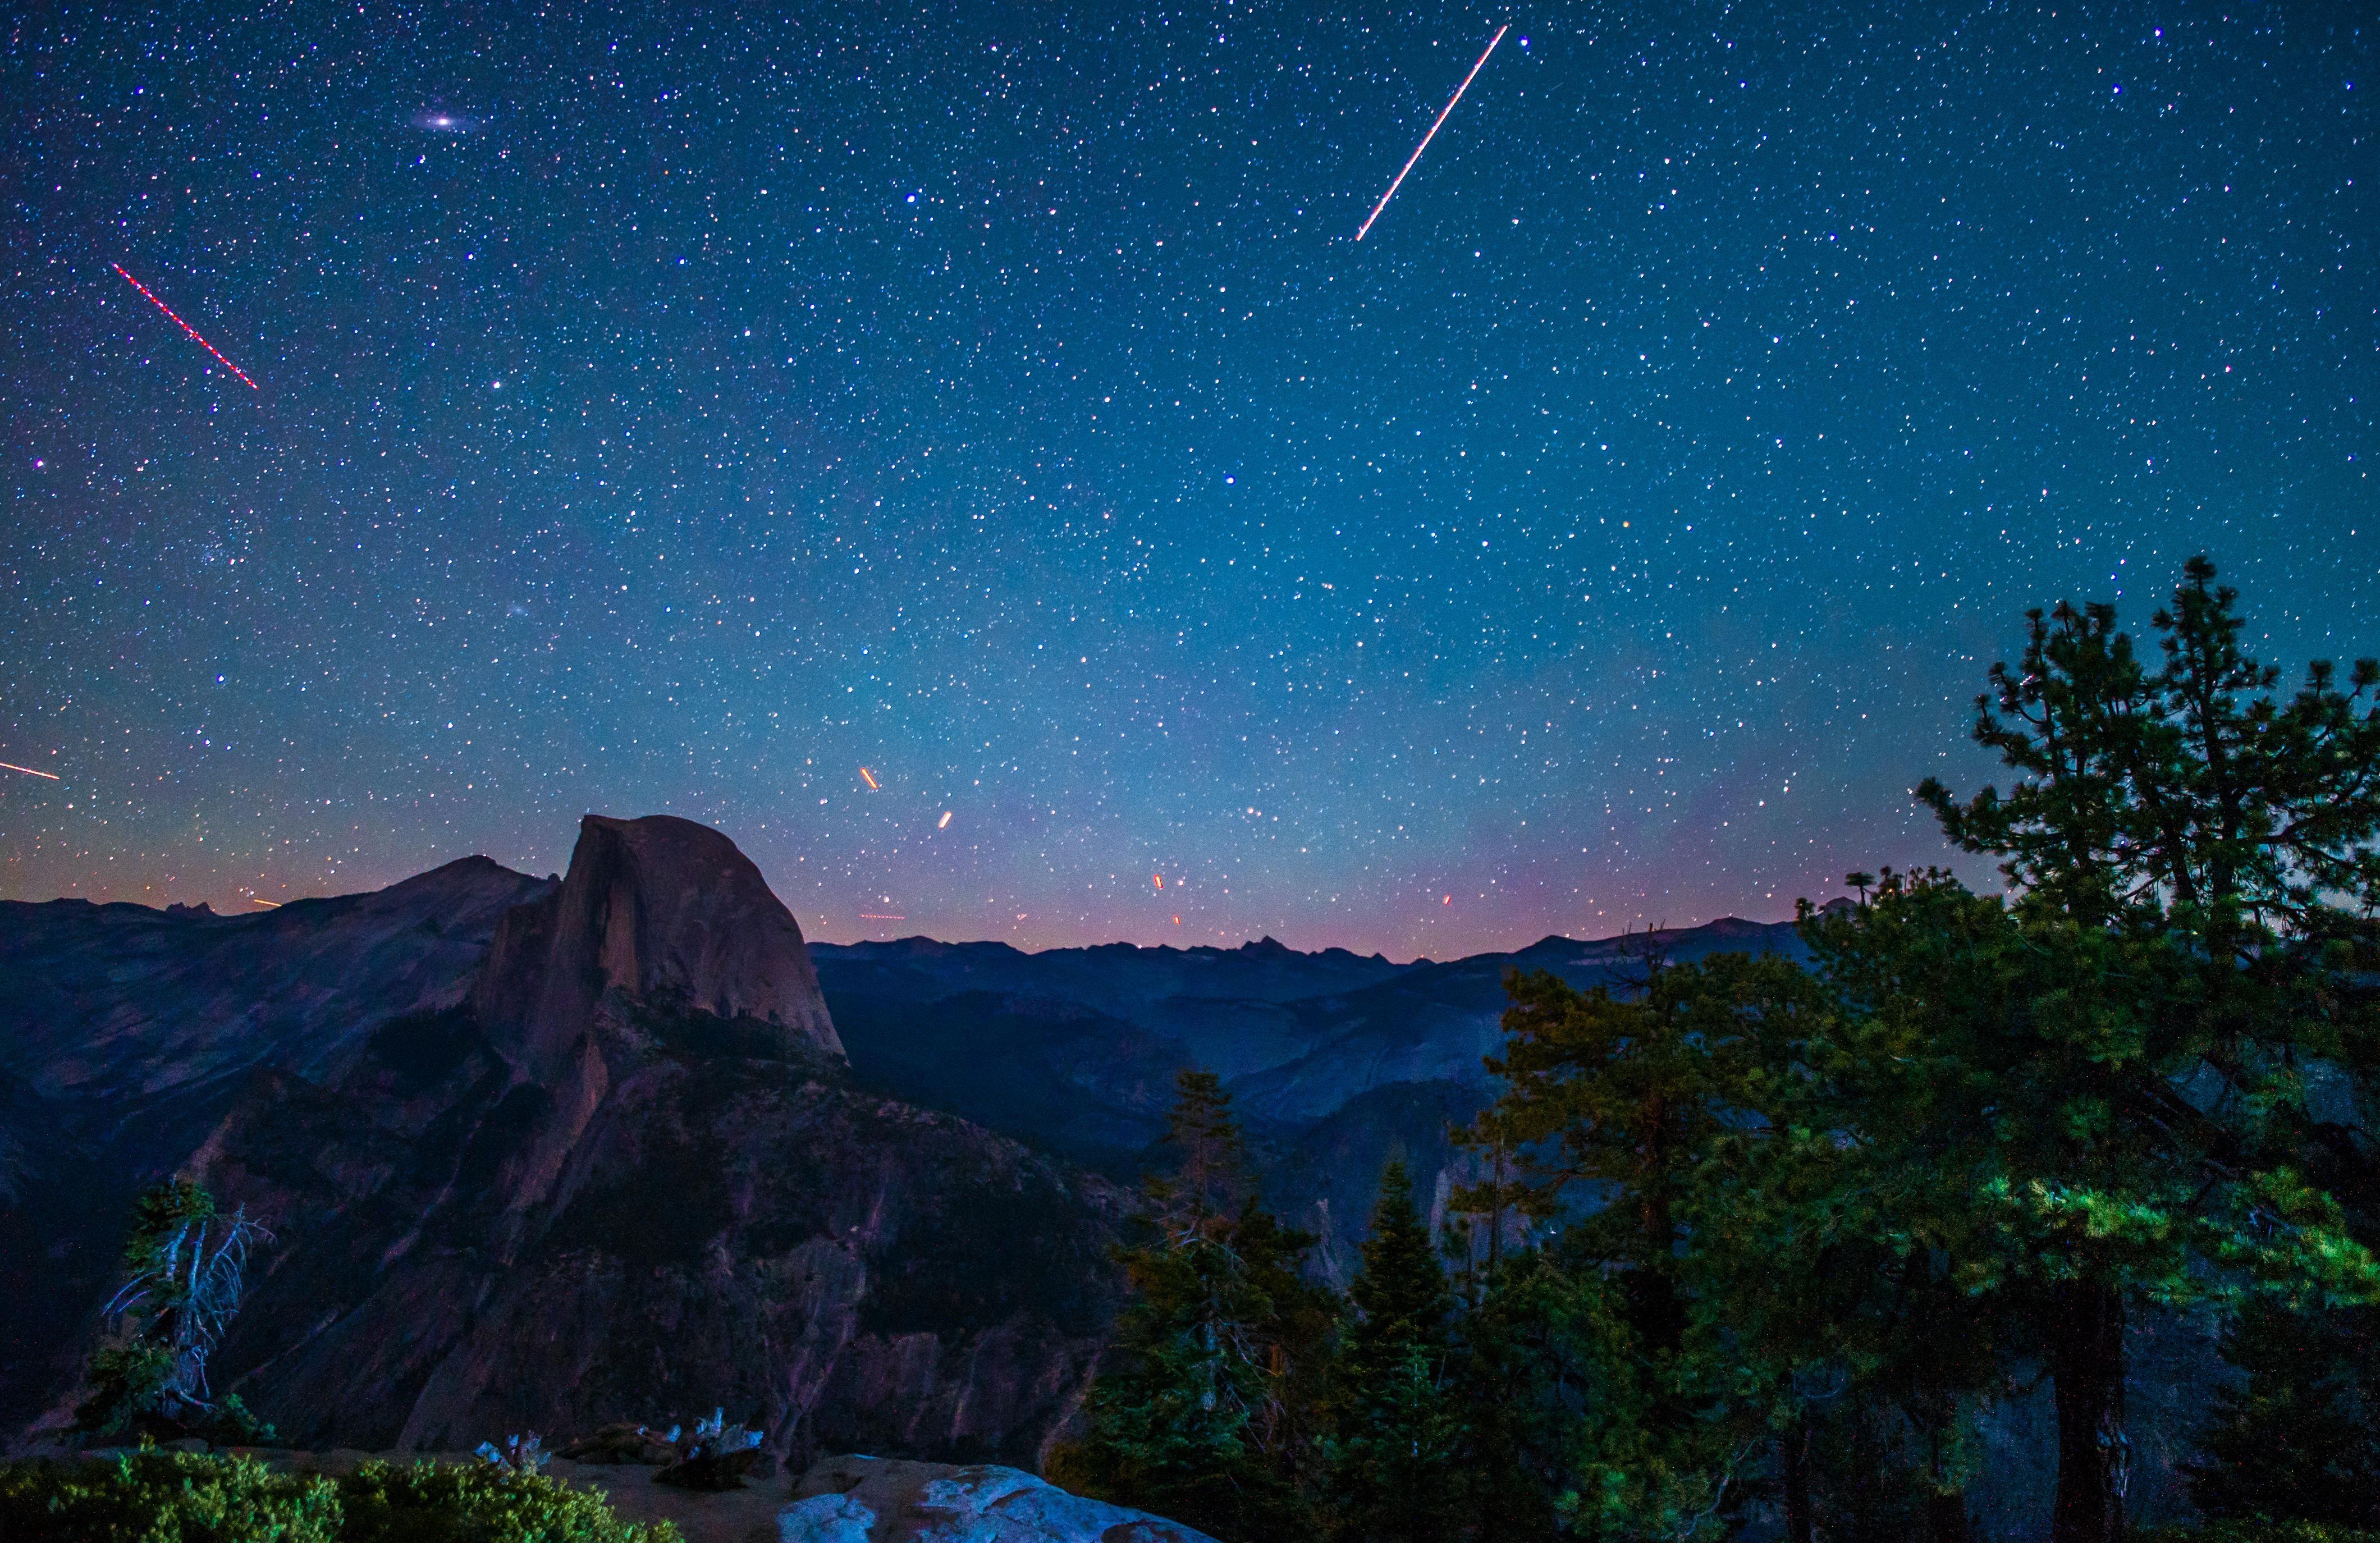 Yosemite At Night Oc 4240 2749 Reddit Long Exposure Photography Night Sky Photography Landscape Photography